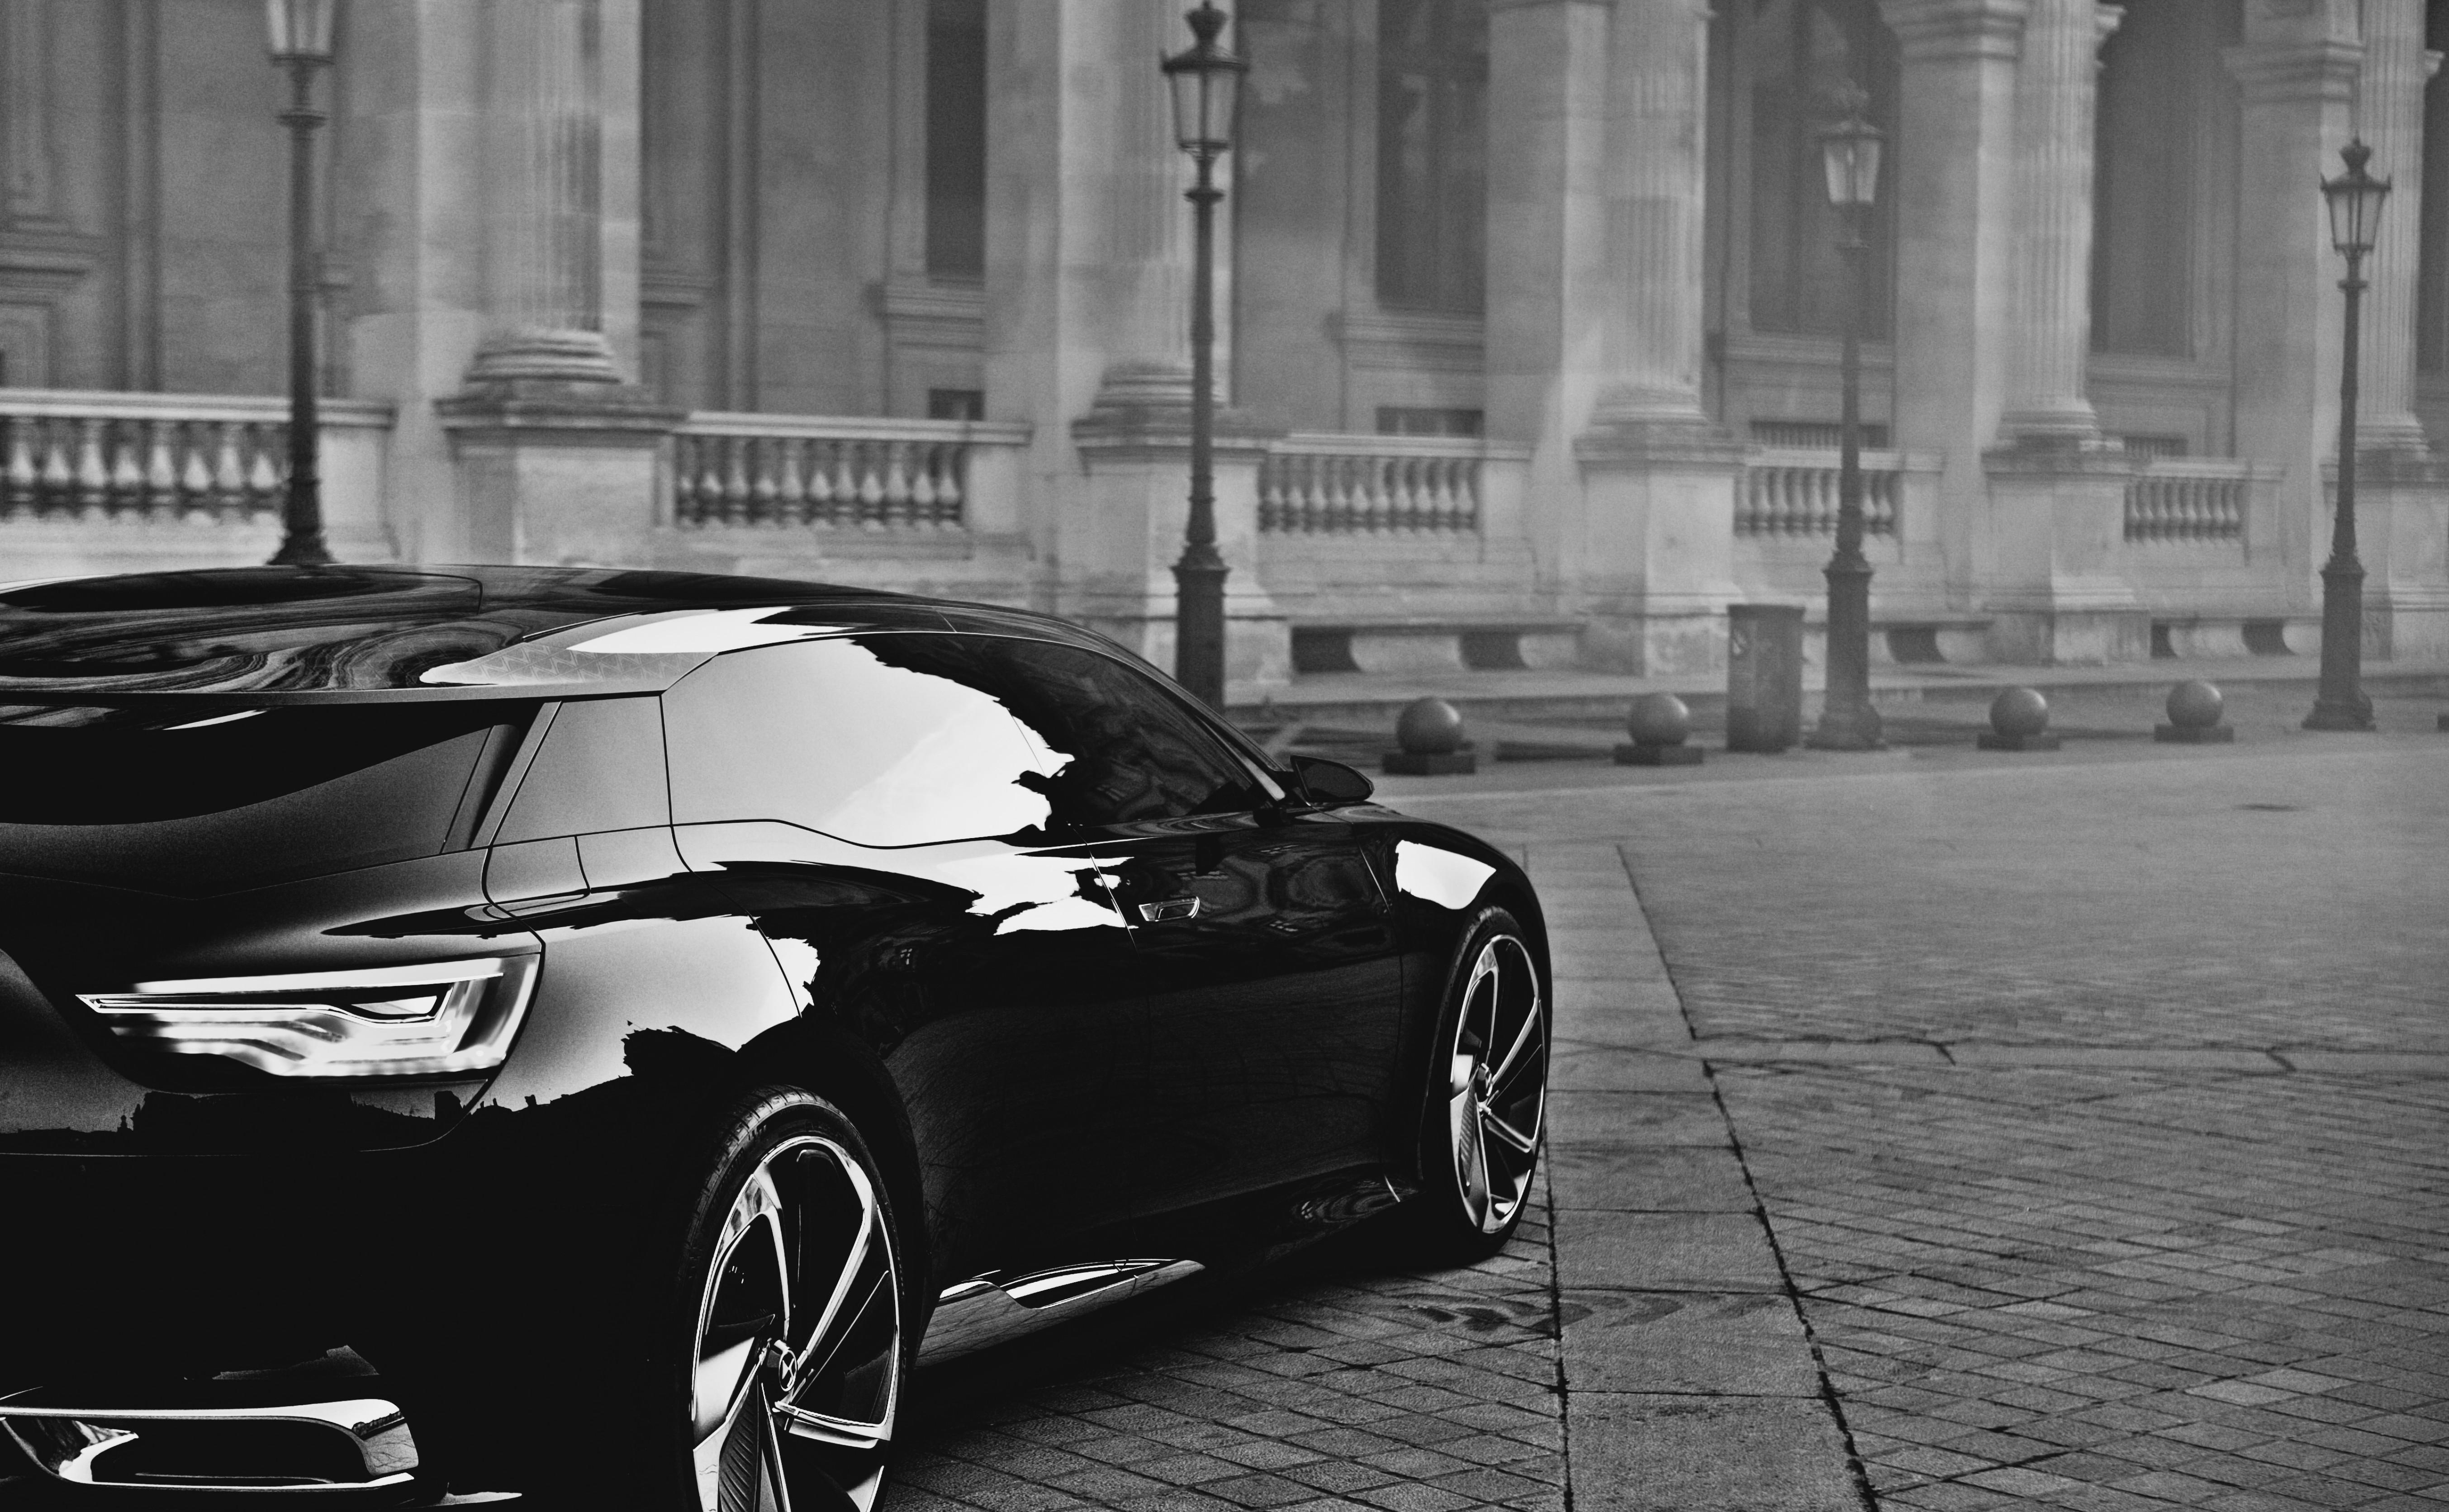 Luxury Vehicle: Wallpaper Citroen DS9, Supercar, NUMERO 9, Concept, Luxury